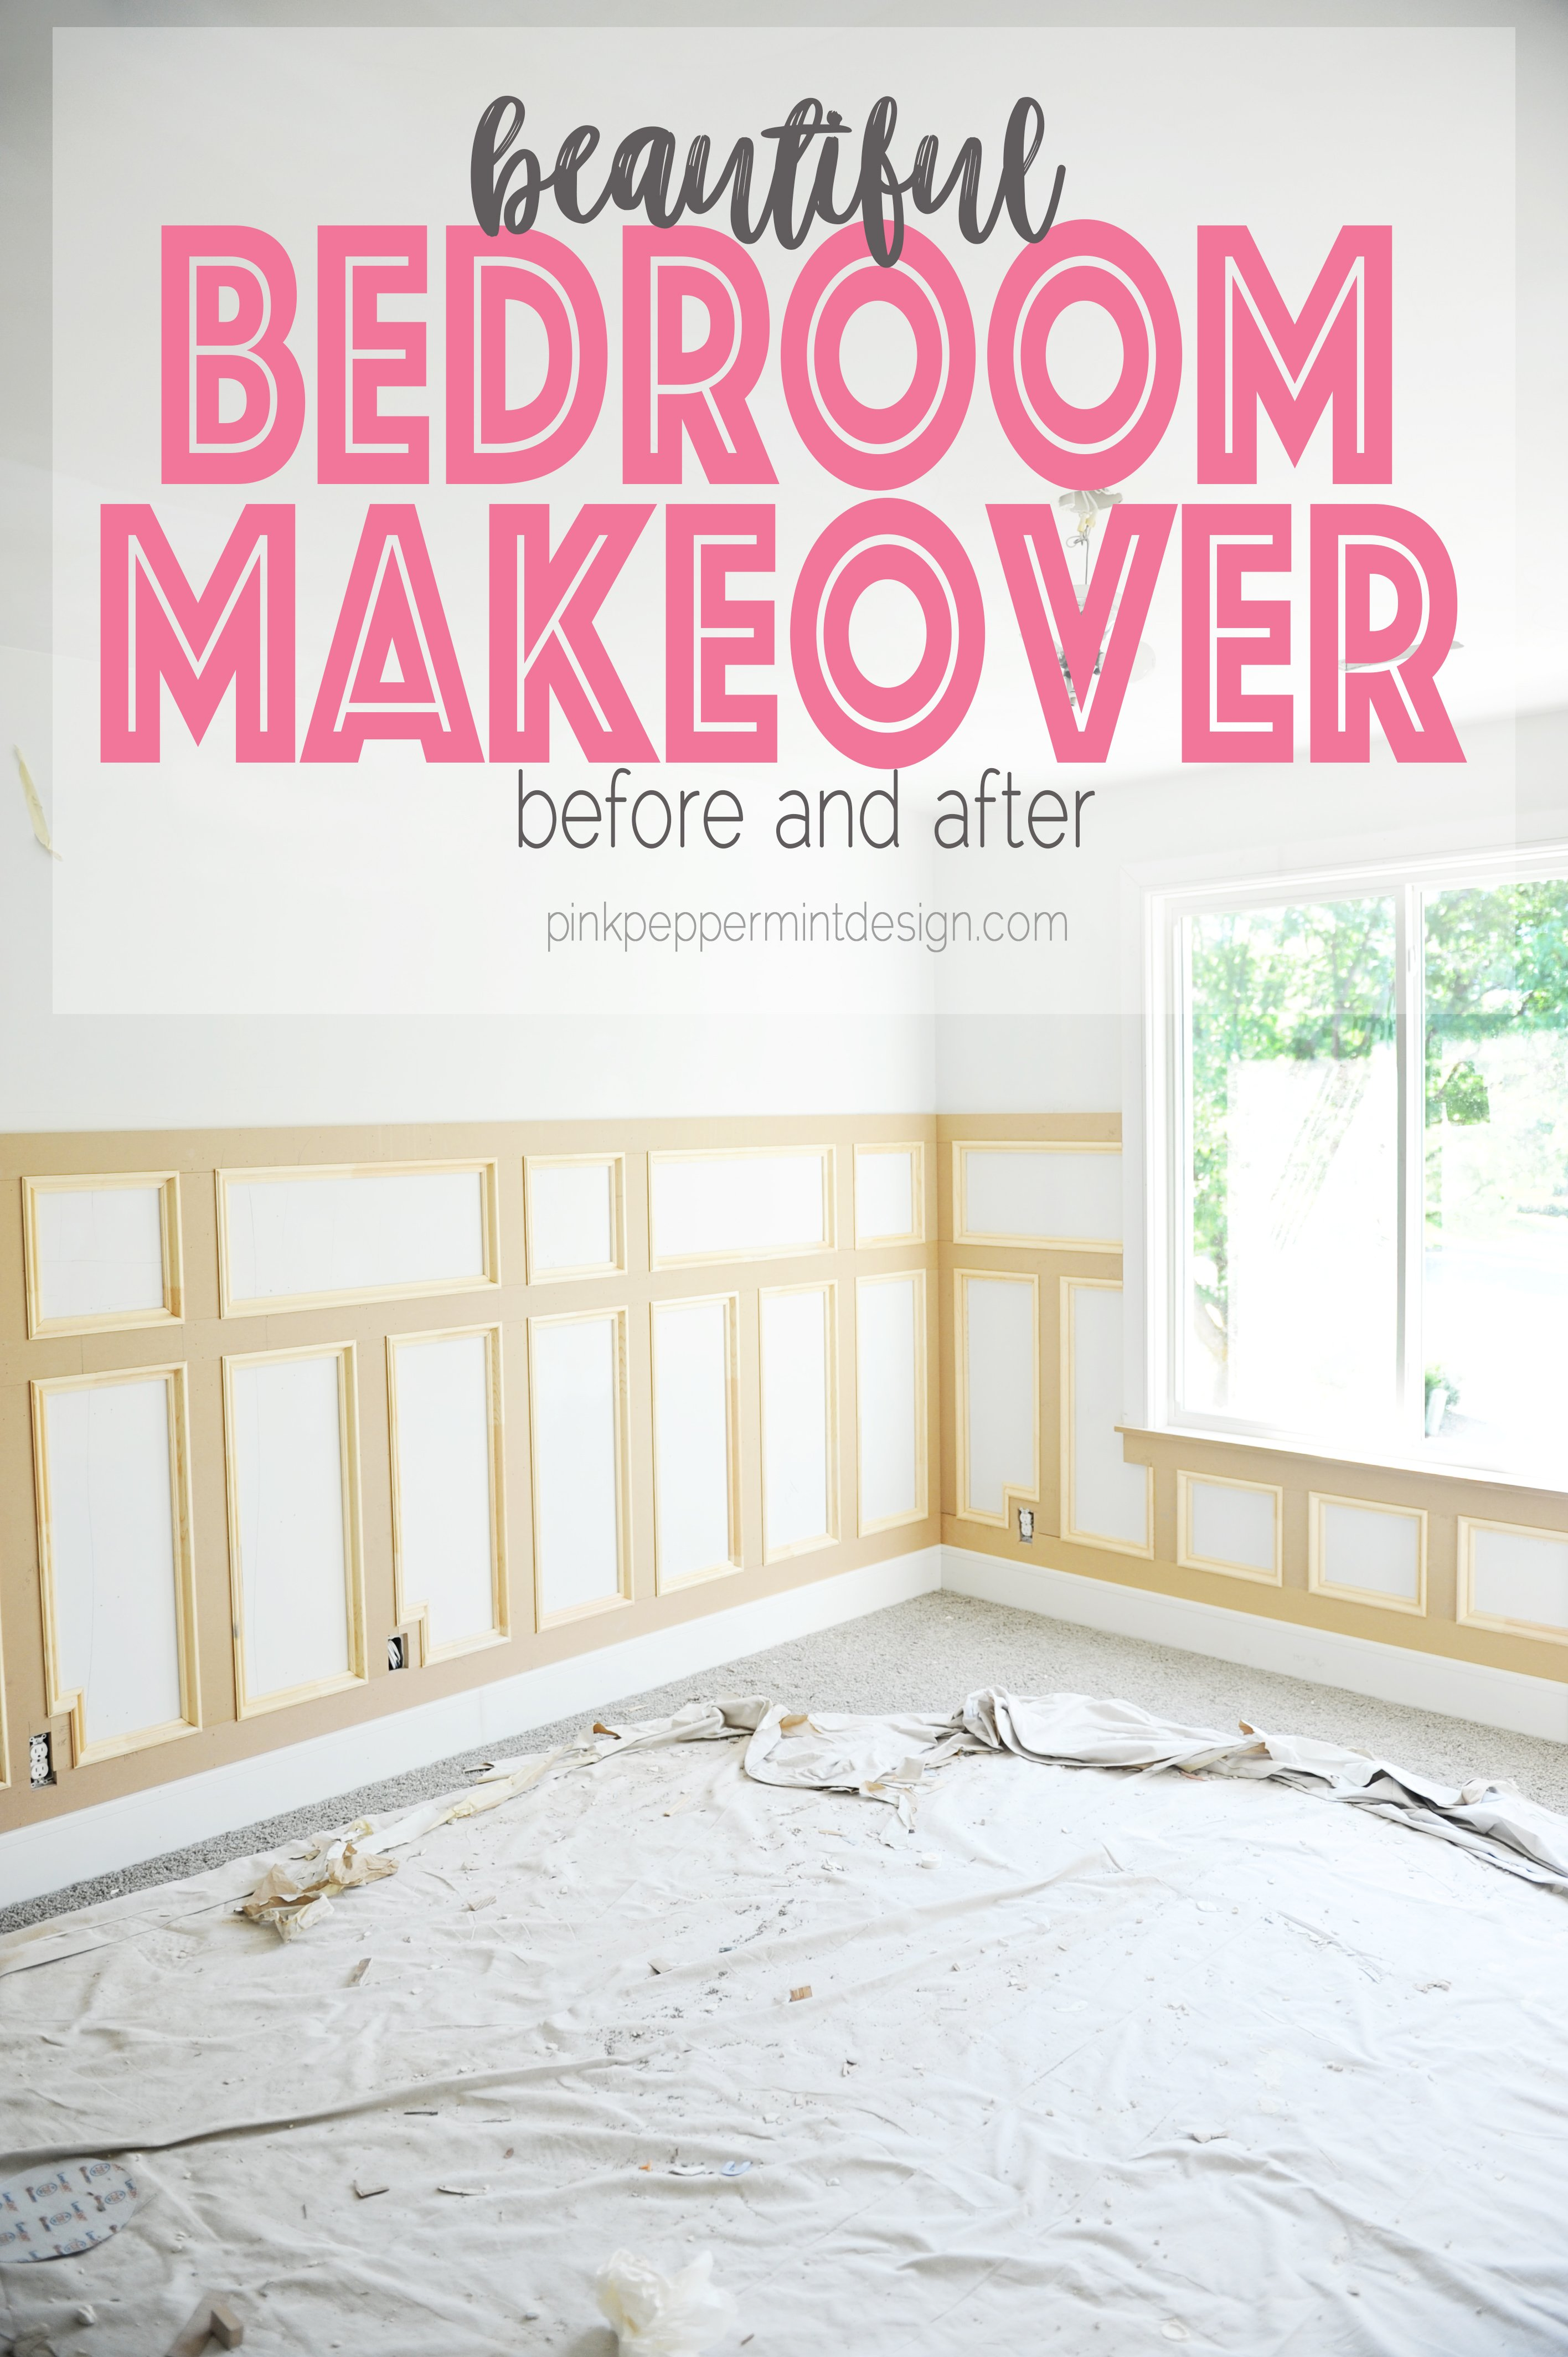 Bedroom makevoer before and after